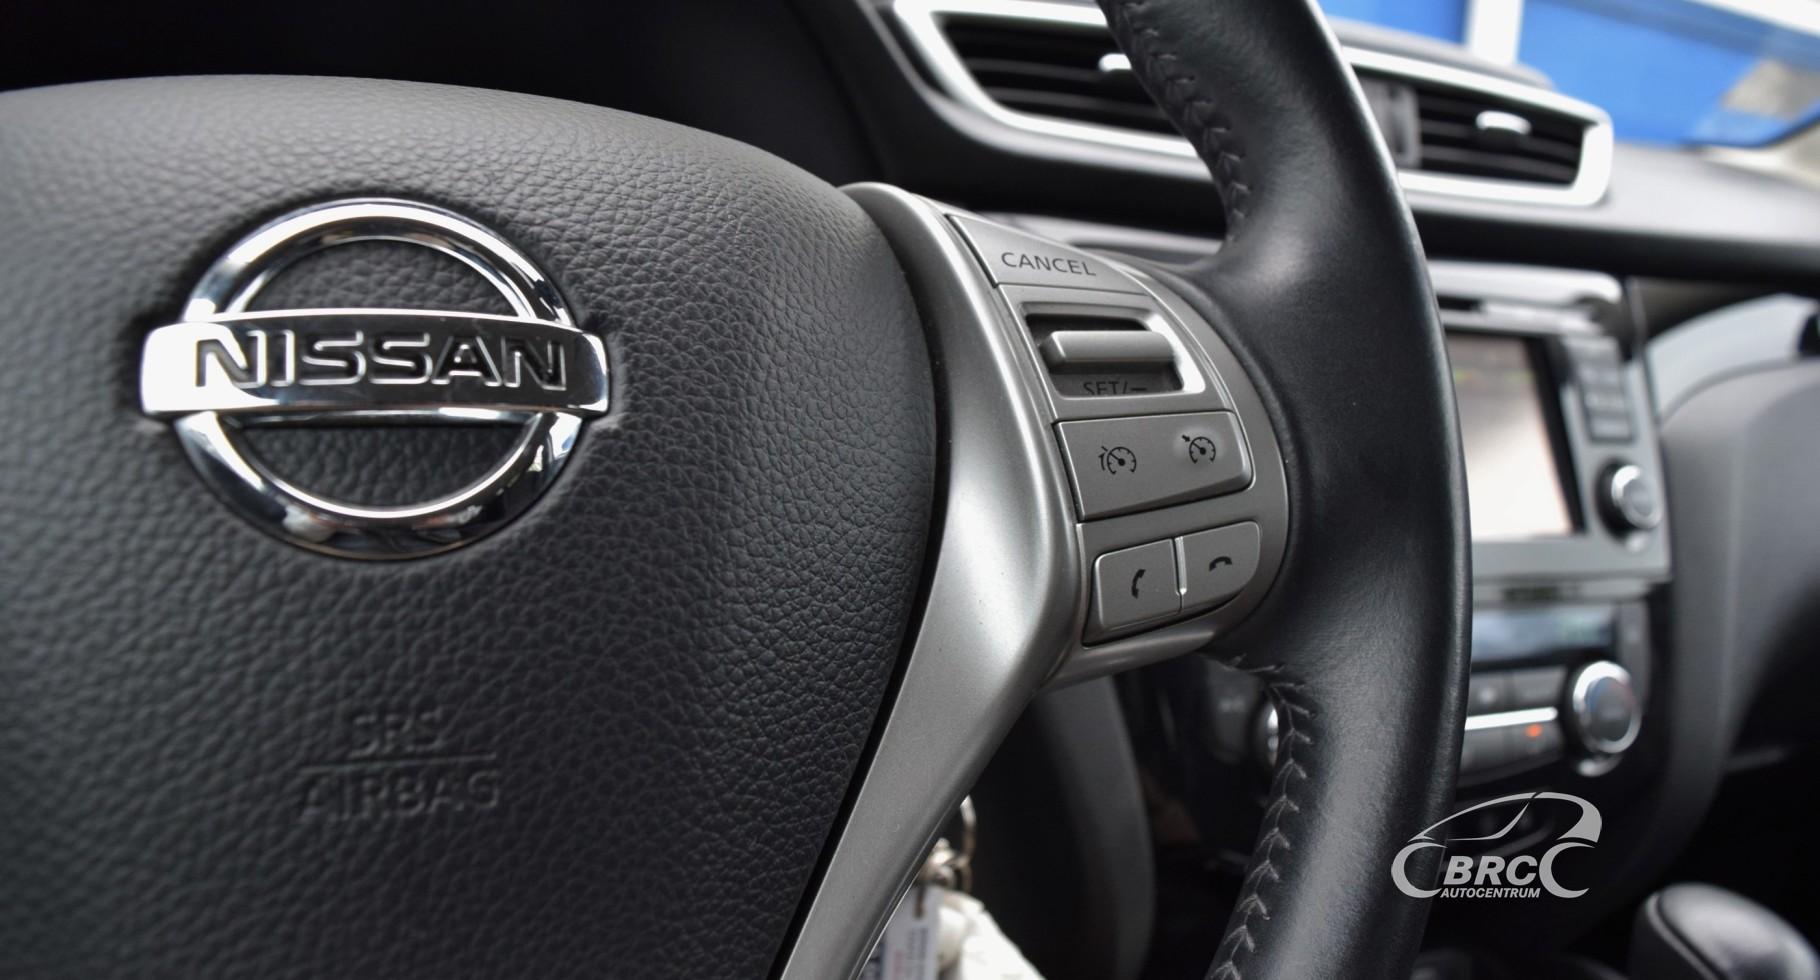 Nissan Qashqai A/T